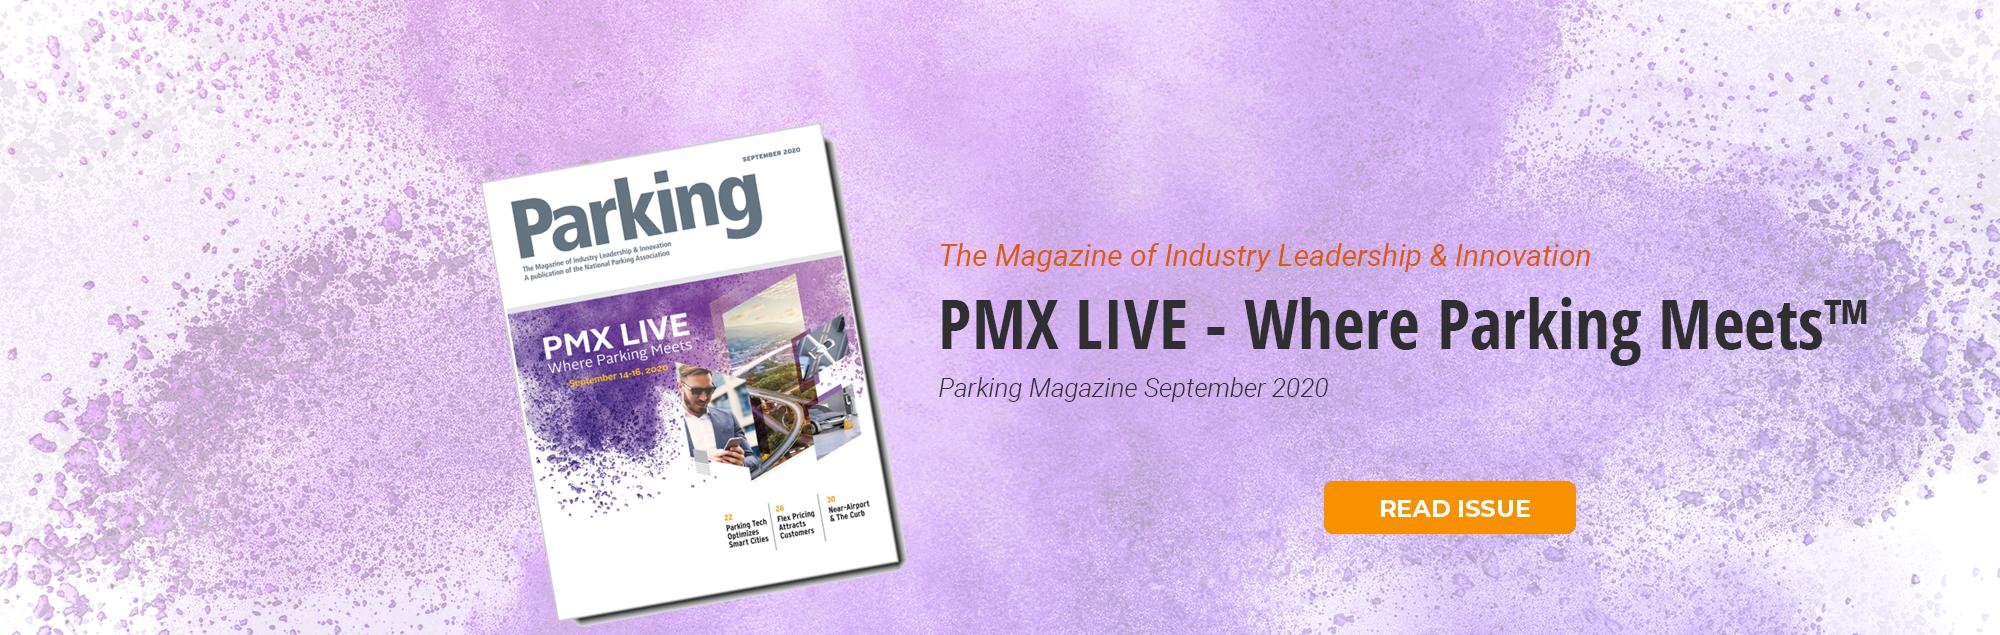 Parking Mag